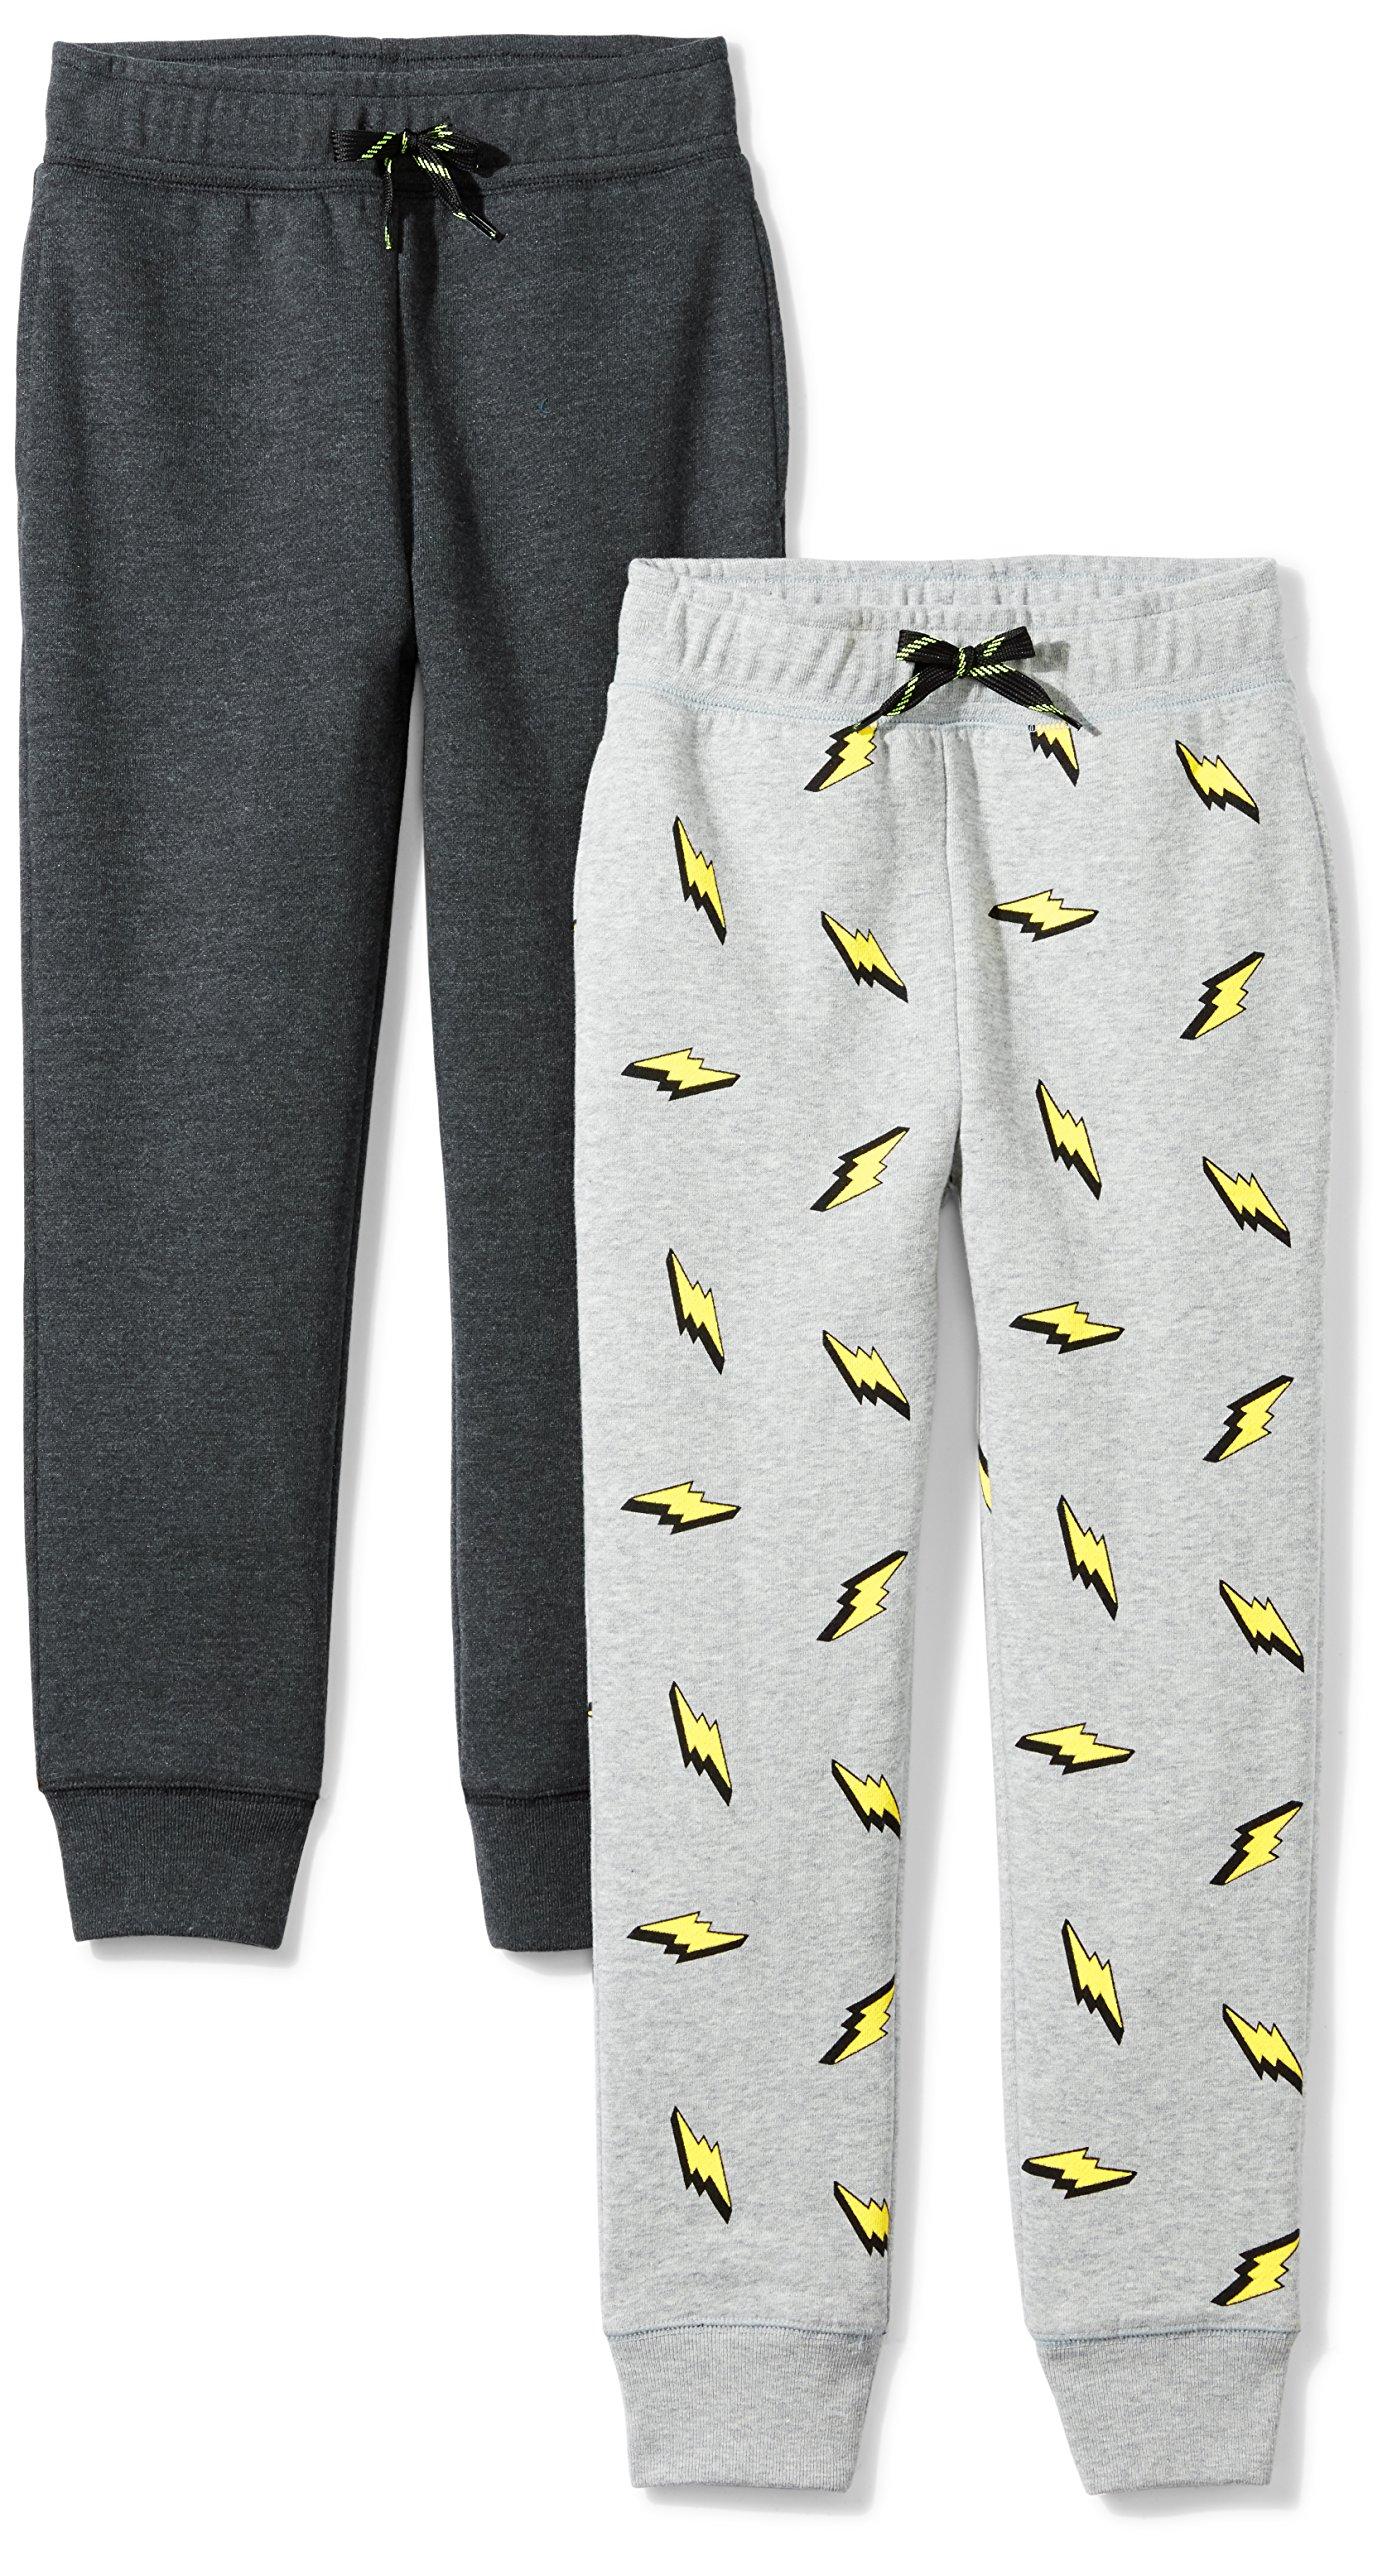 Spotted Zebra Little Boys' 2-Pack Fleece Jogger Pants, Lightning Bolt/Grey, X-Small (4-5)